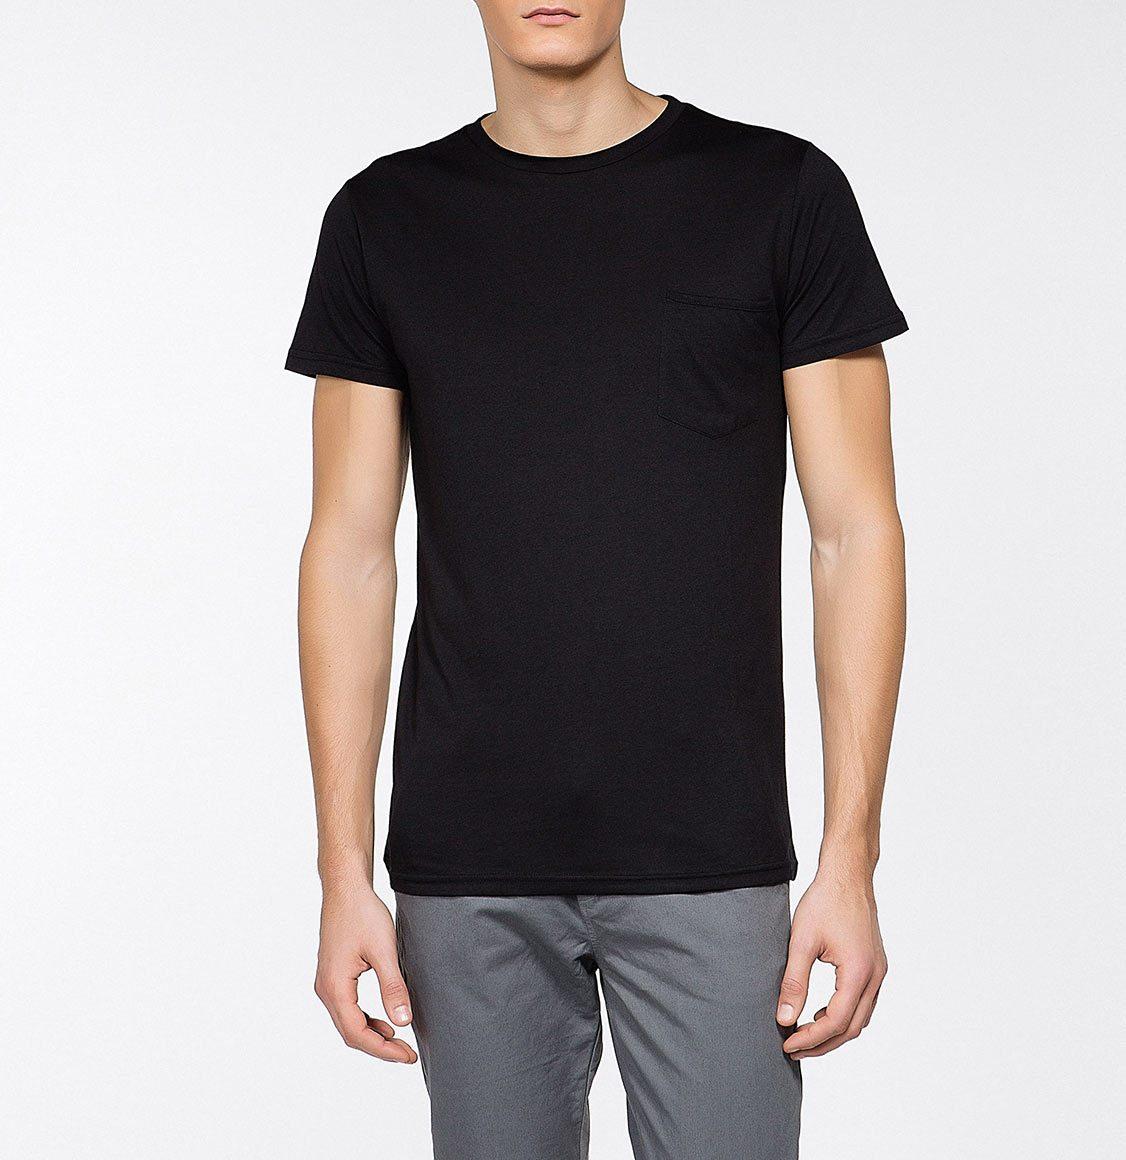 The Project Garments Crew Neck Modal-Blend Pocket T-shirt Black